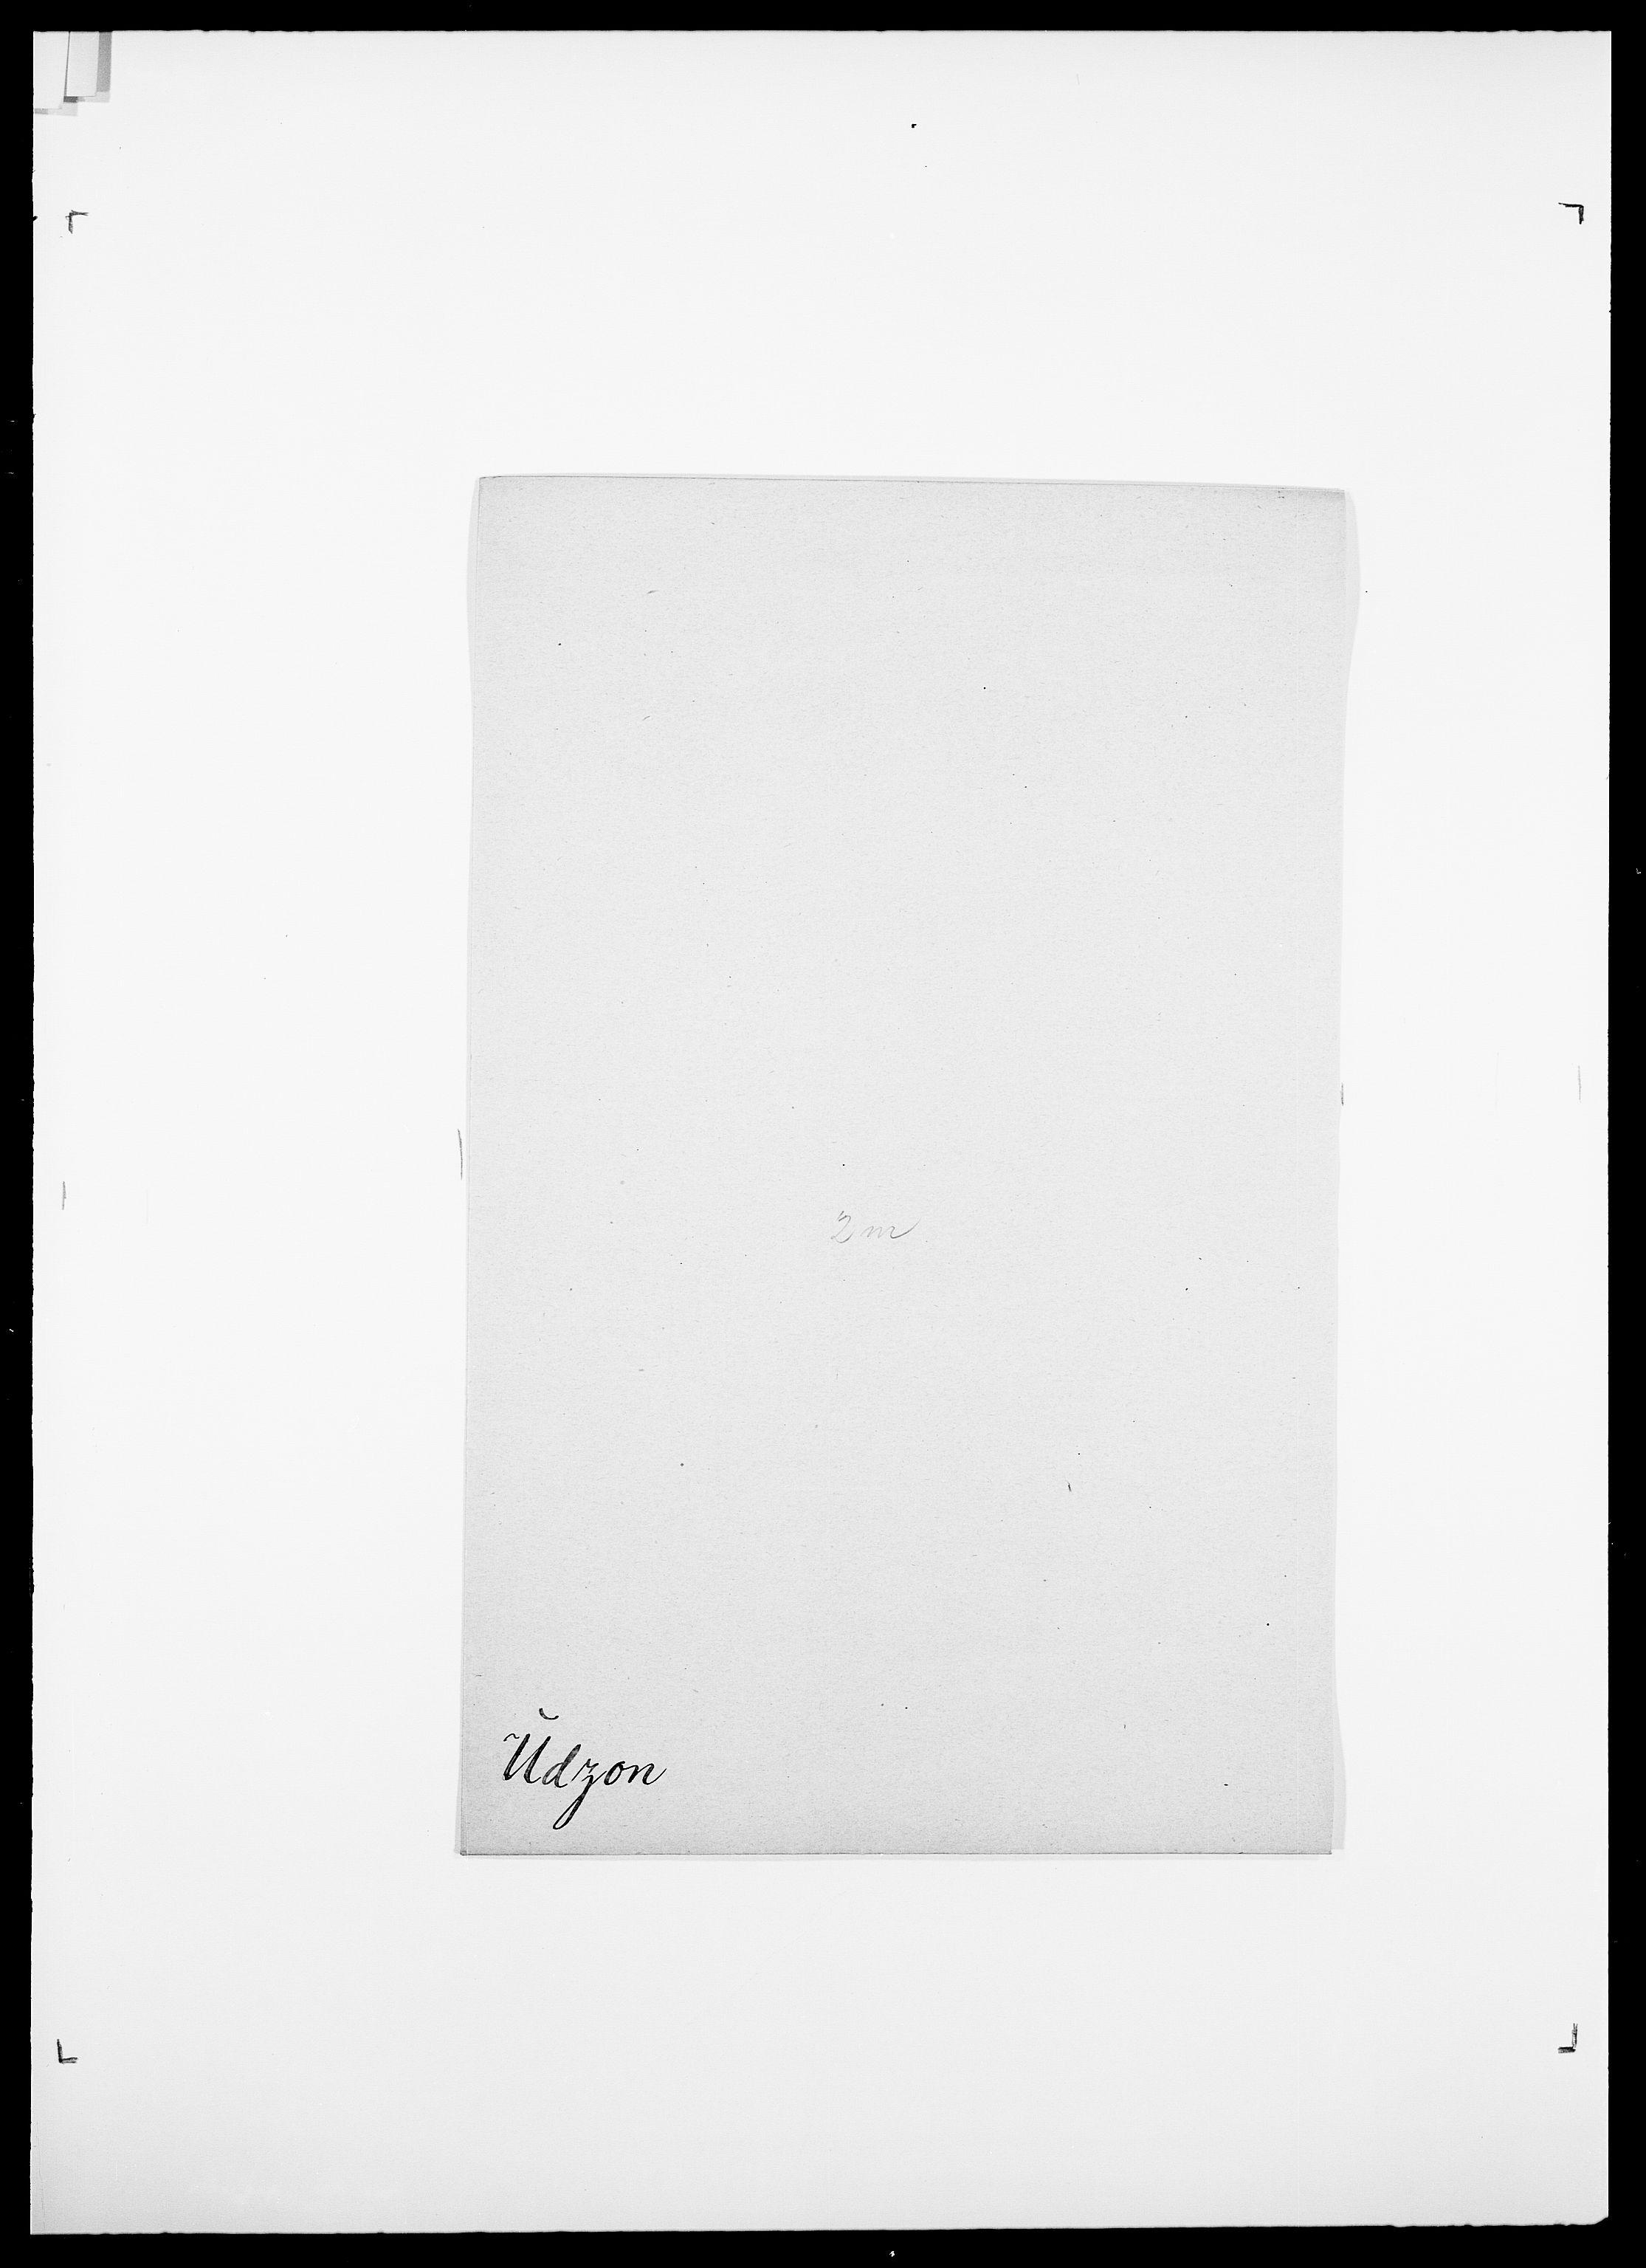 SAO, Delgobe, Charles Antoine - samling, D/Da/L0039: Thorsen - Urup, s. 626